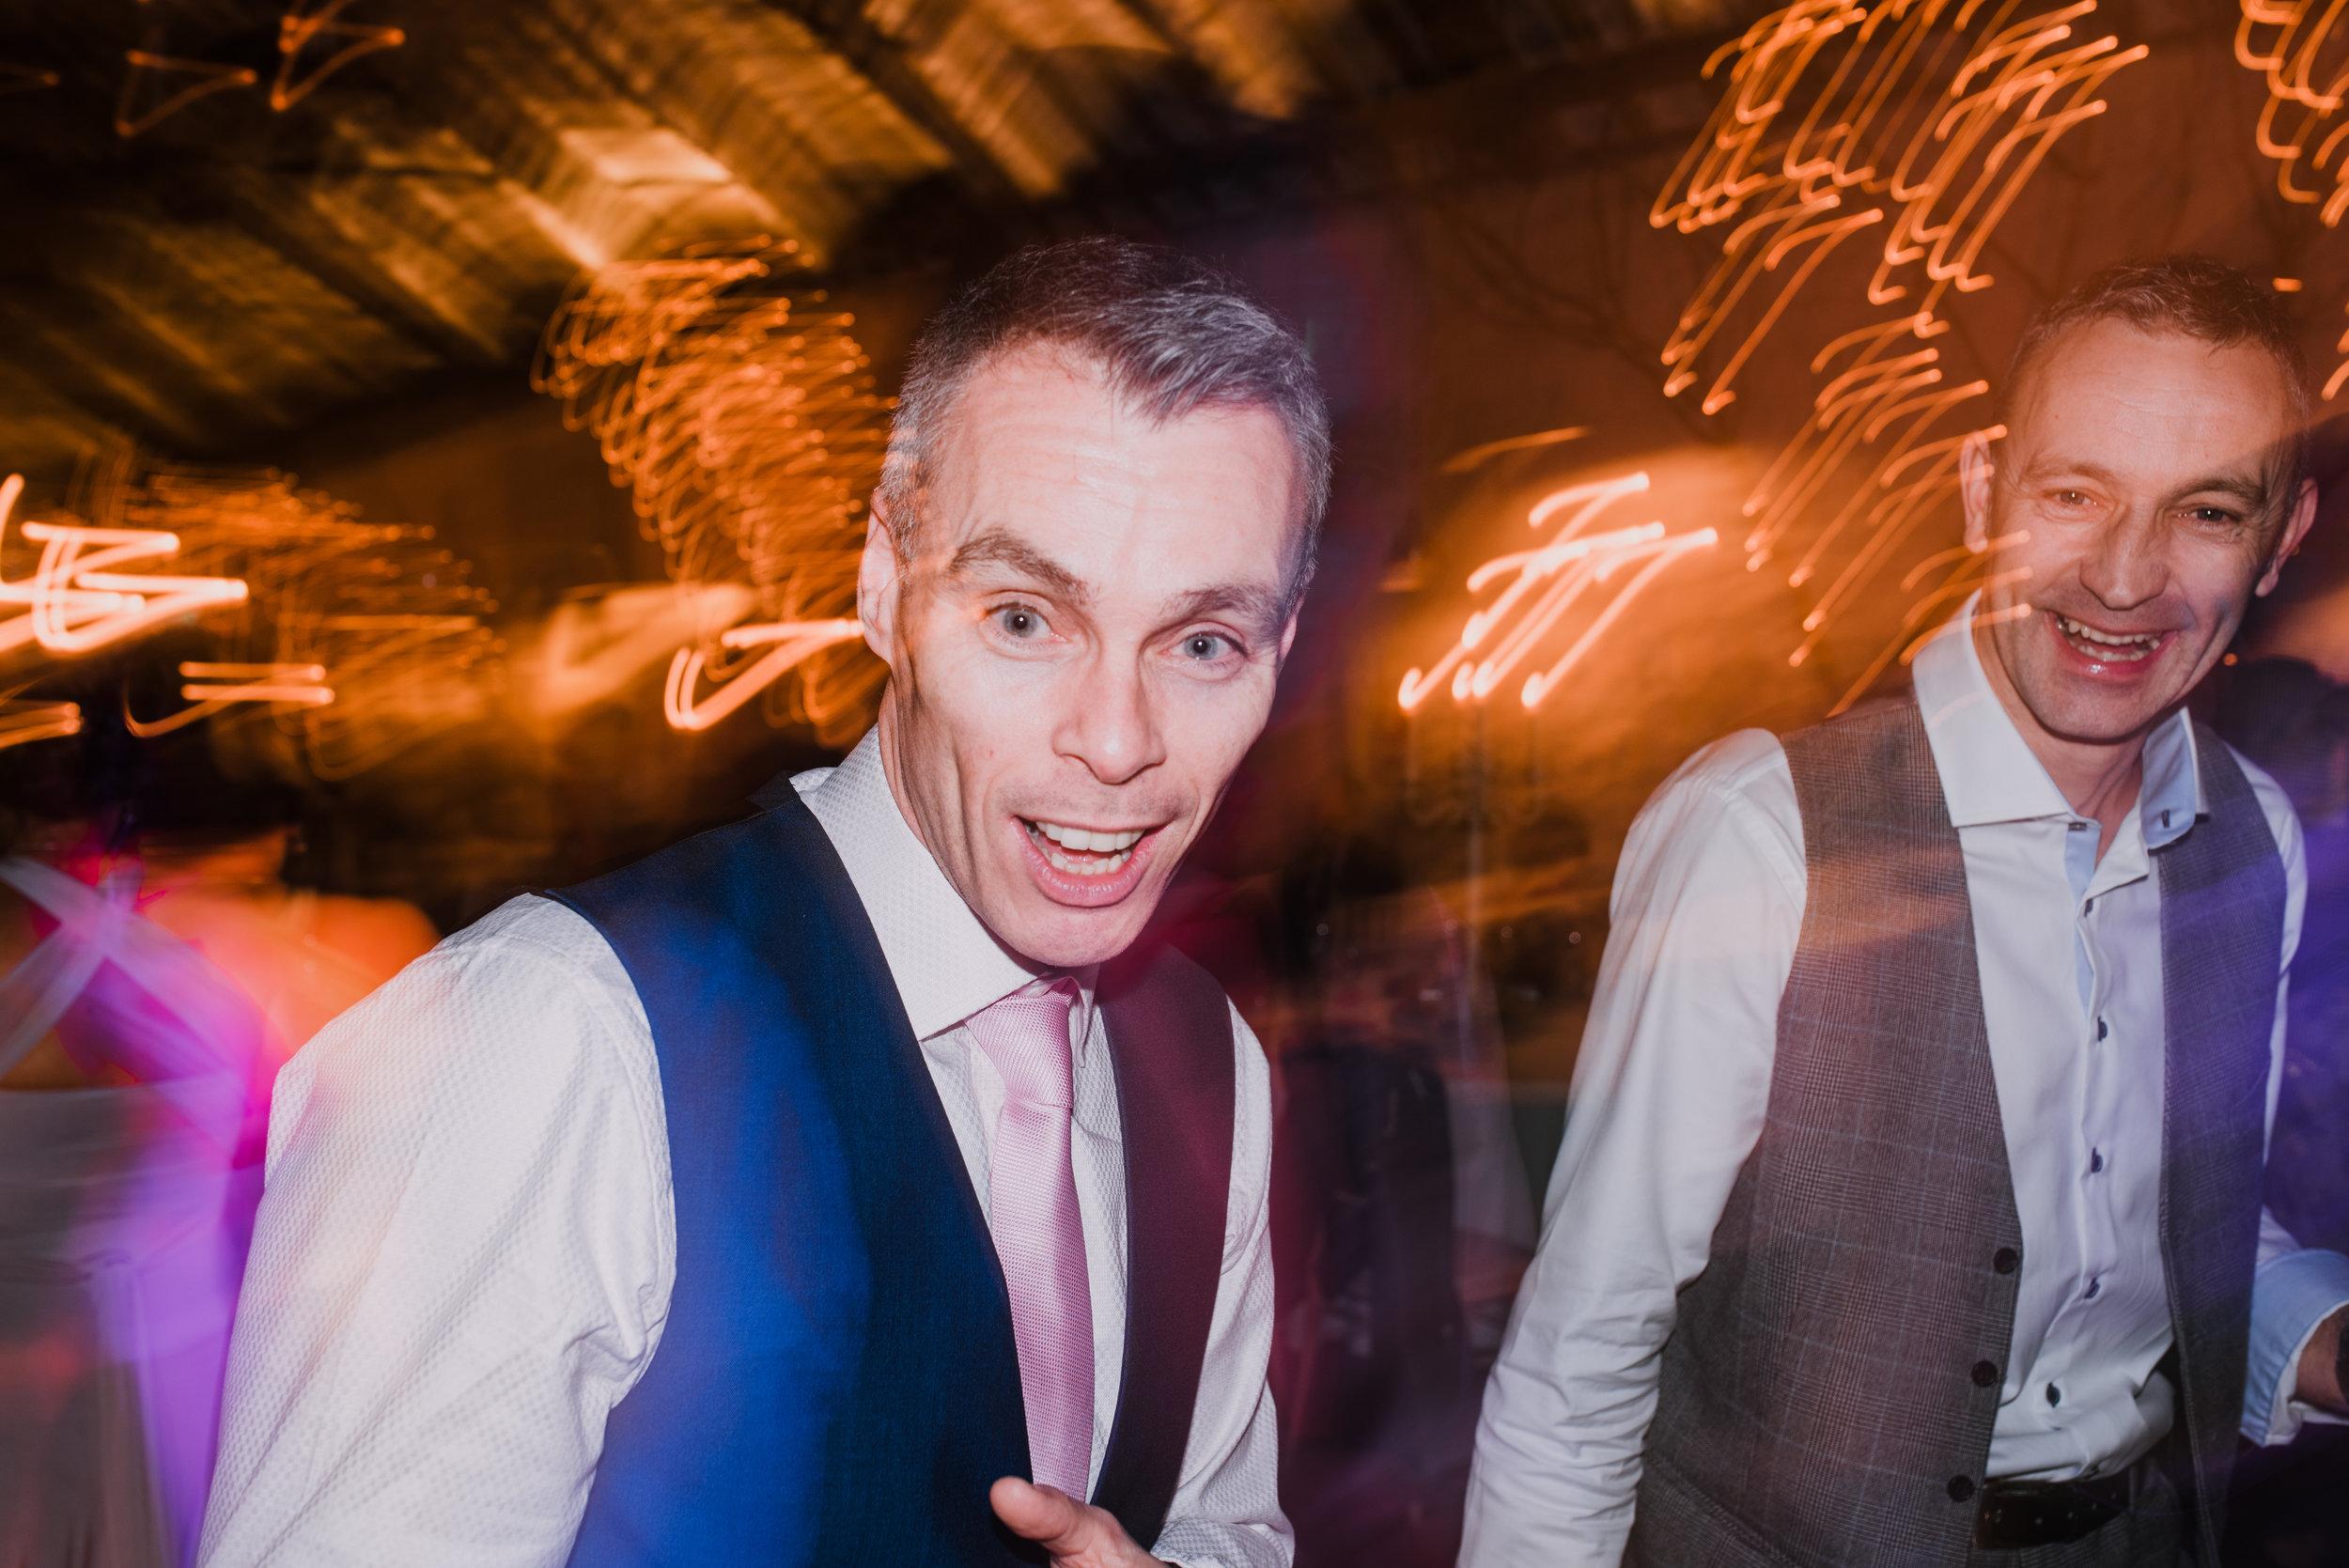 larchfield estate wedding, wedding venues northern ireland, barn wedding venues northern ireland, wedding photos larchfield estate, shane todd wedding, irish wedding, first dance (9).jpg